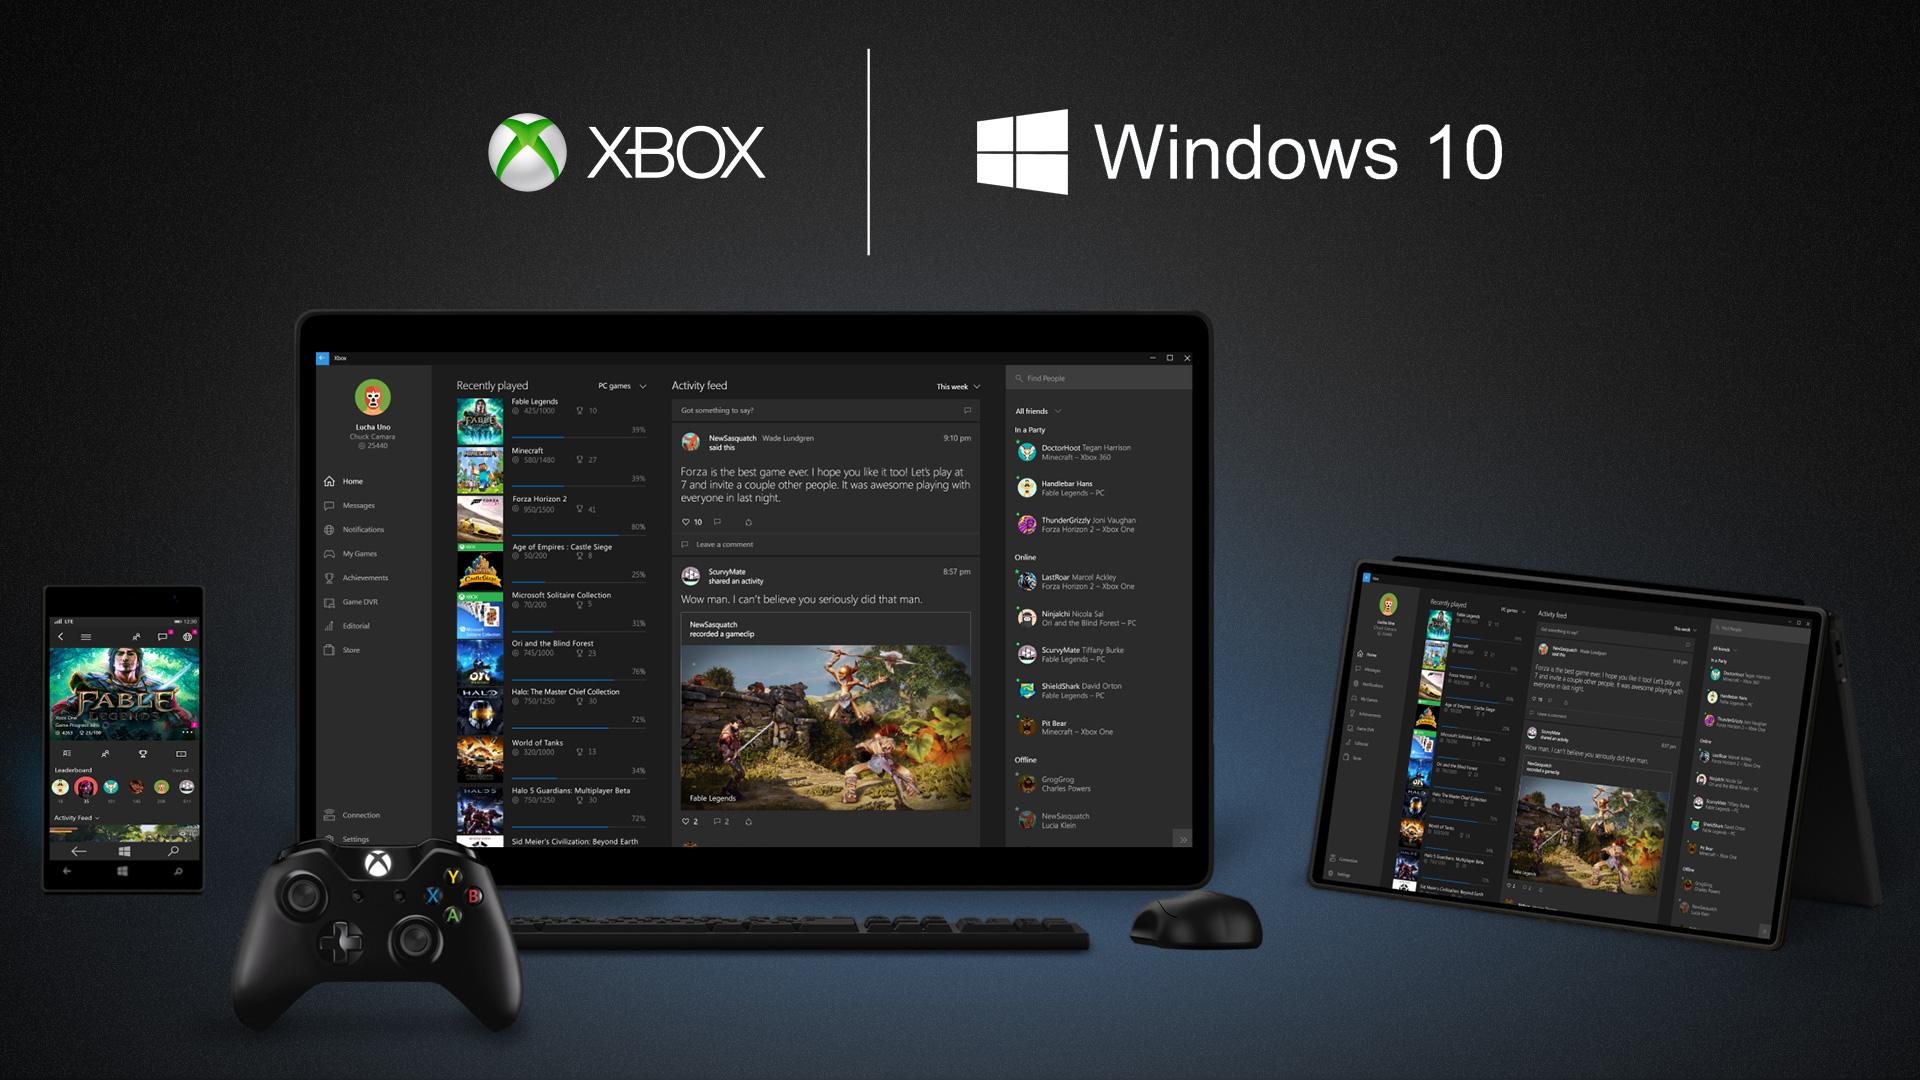 Windows 10 AIO 1703 Build 15063.608 September 2017 دانلود ویندوز 10